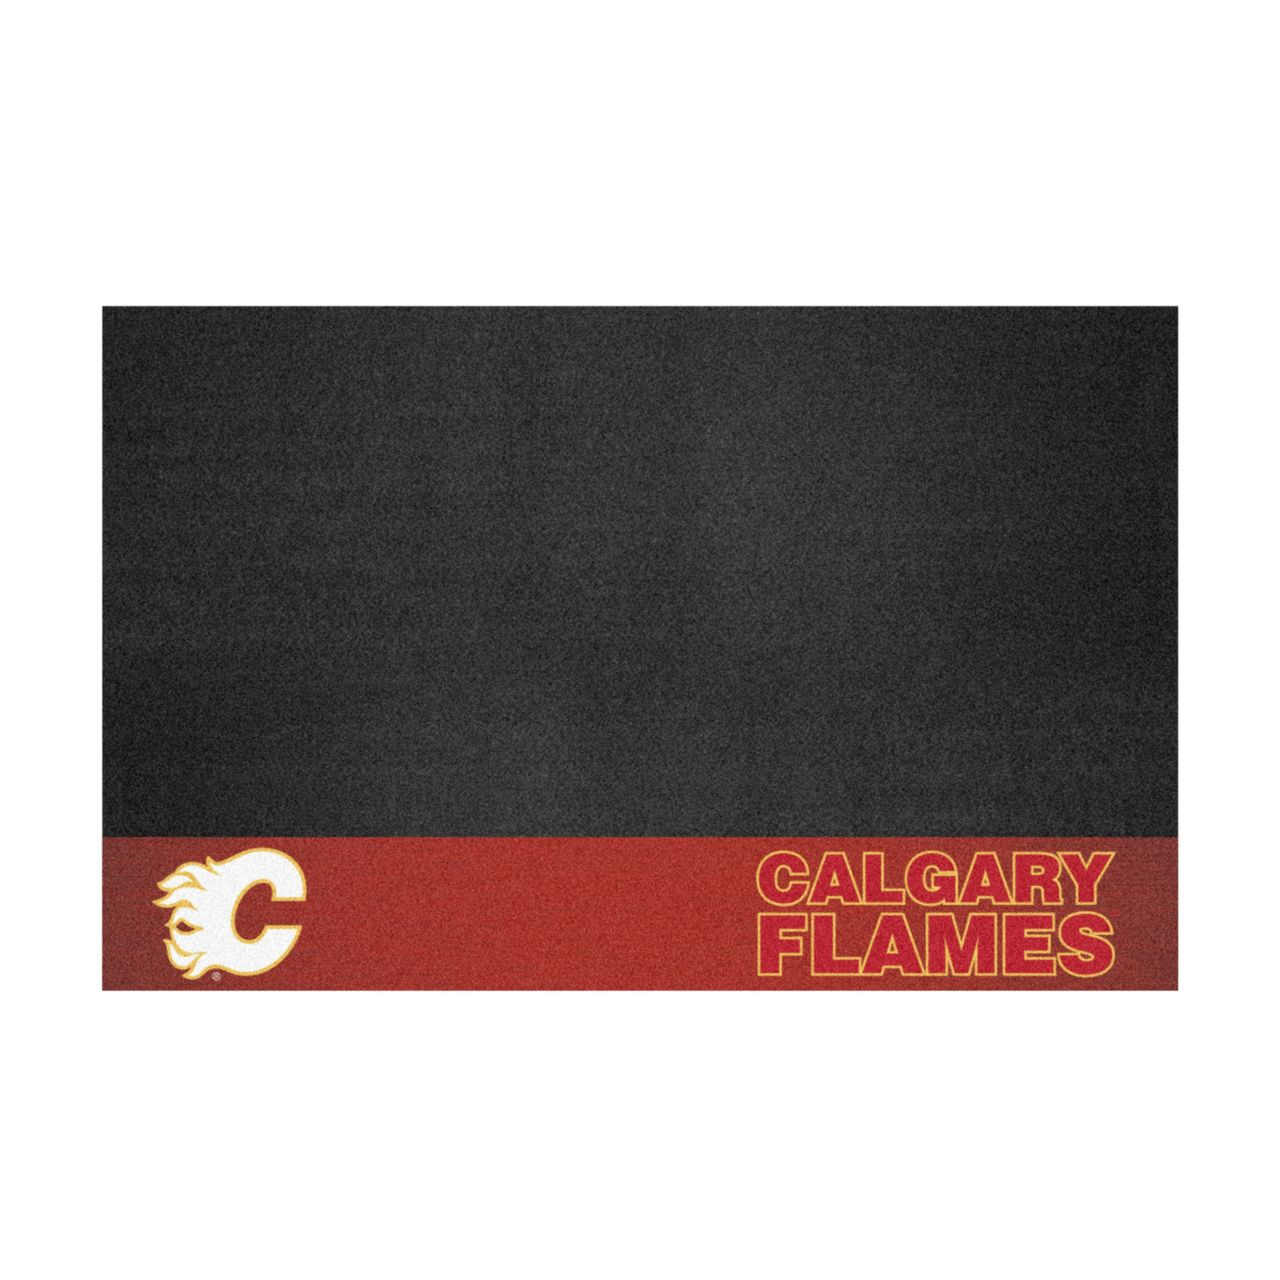 "Fanmats 14228 NHL - Calgary Flames Grill Mat 26""x42"""